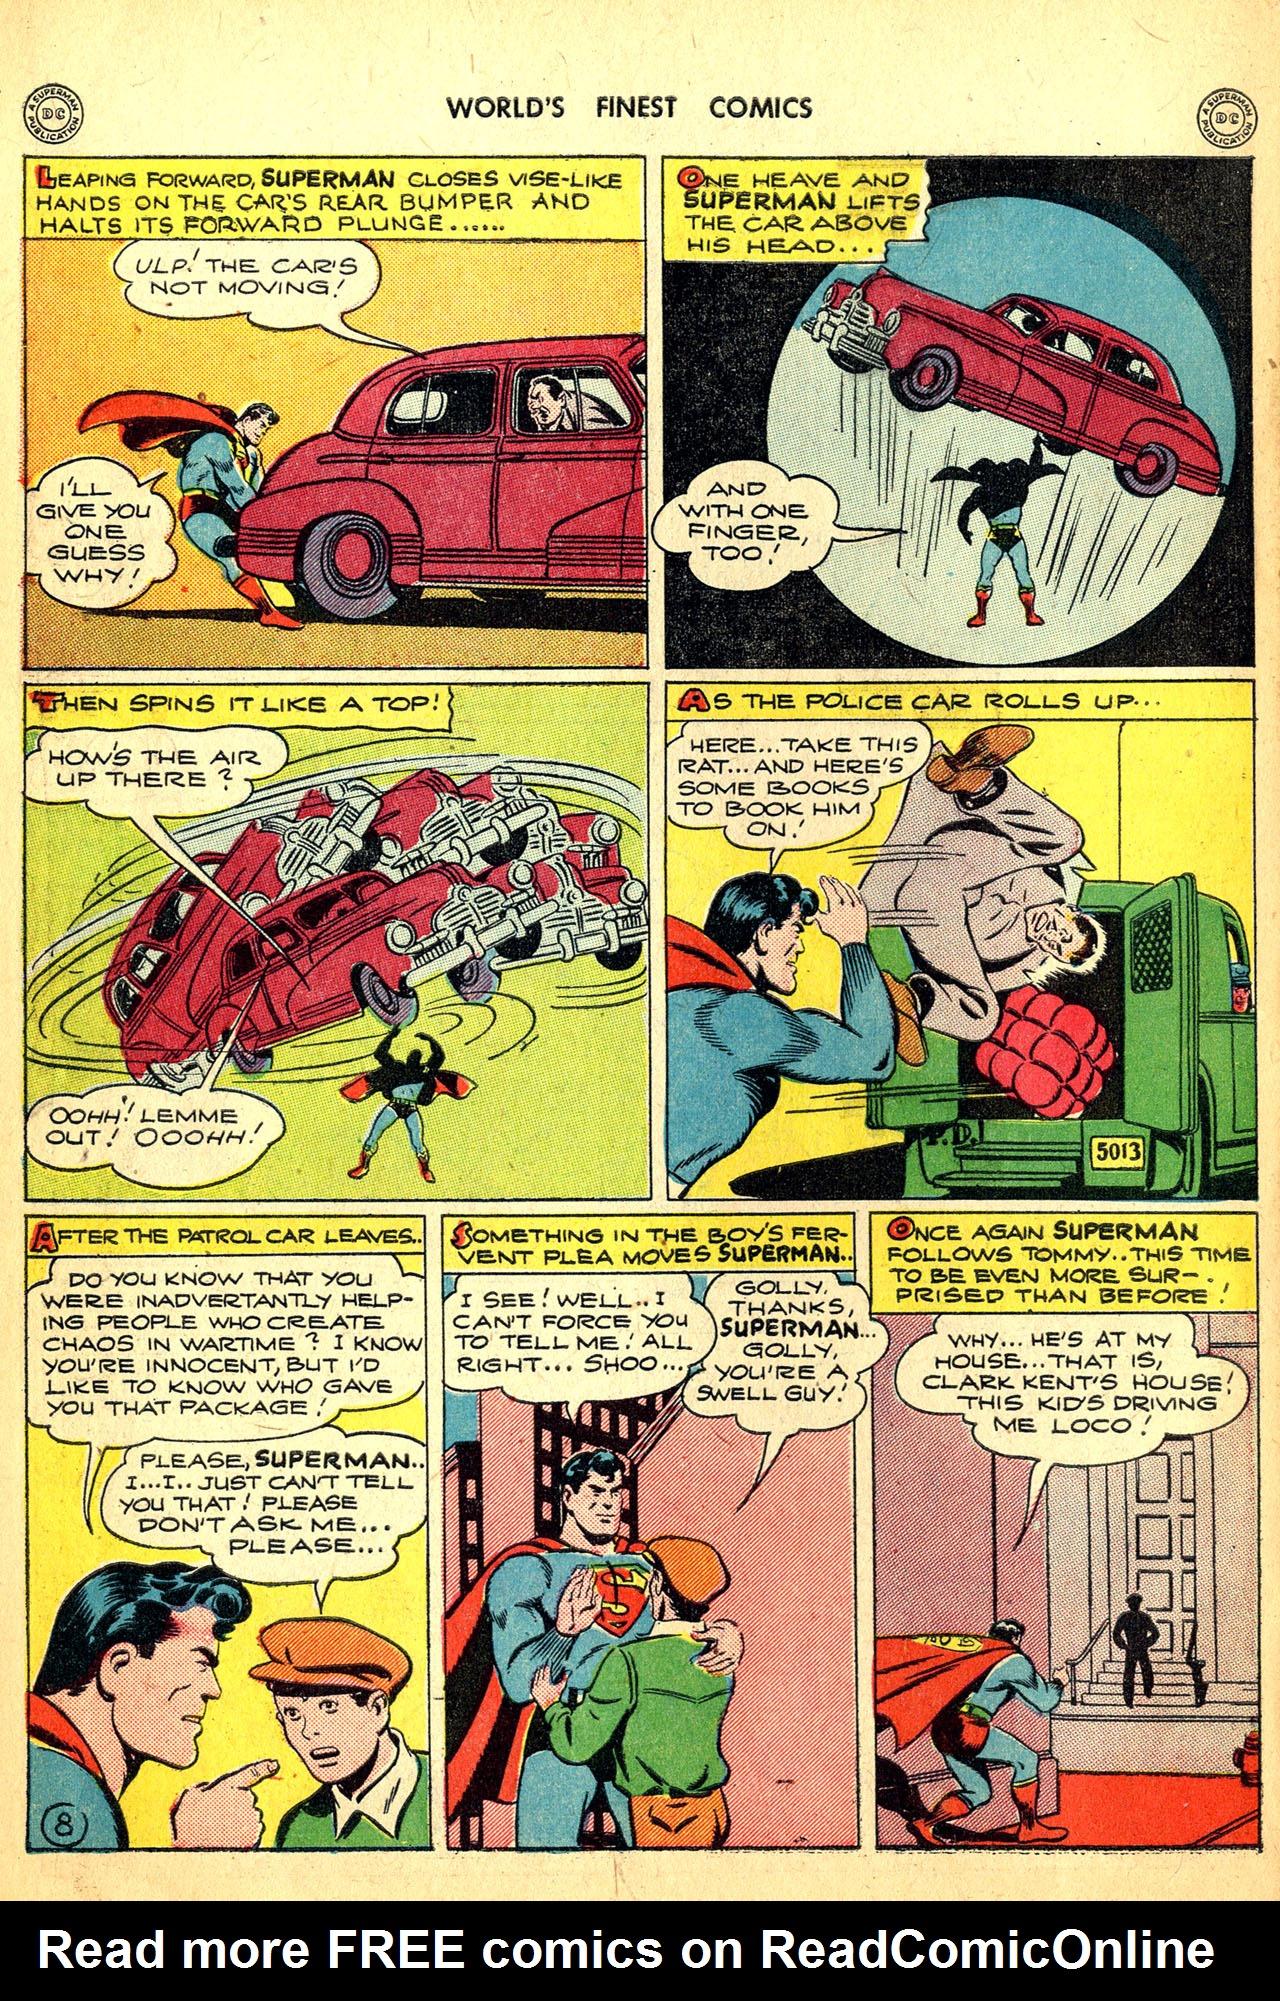 Read online World's Finest Comics comic -  Issue #18 - 10